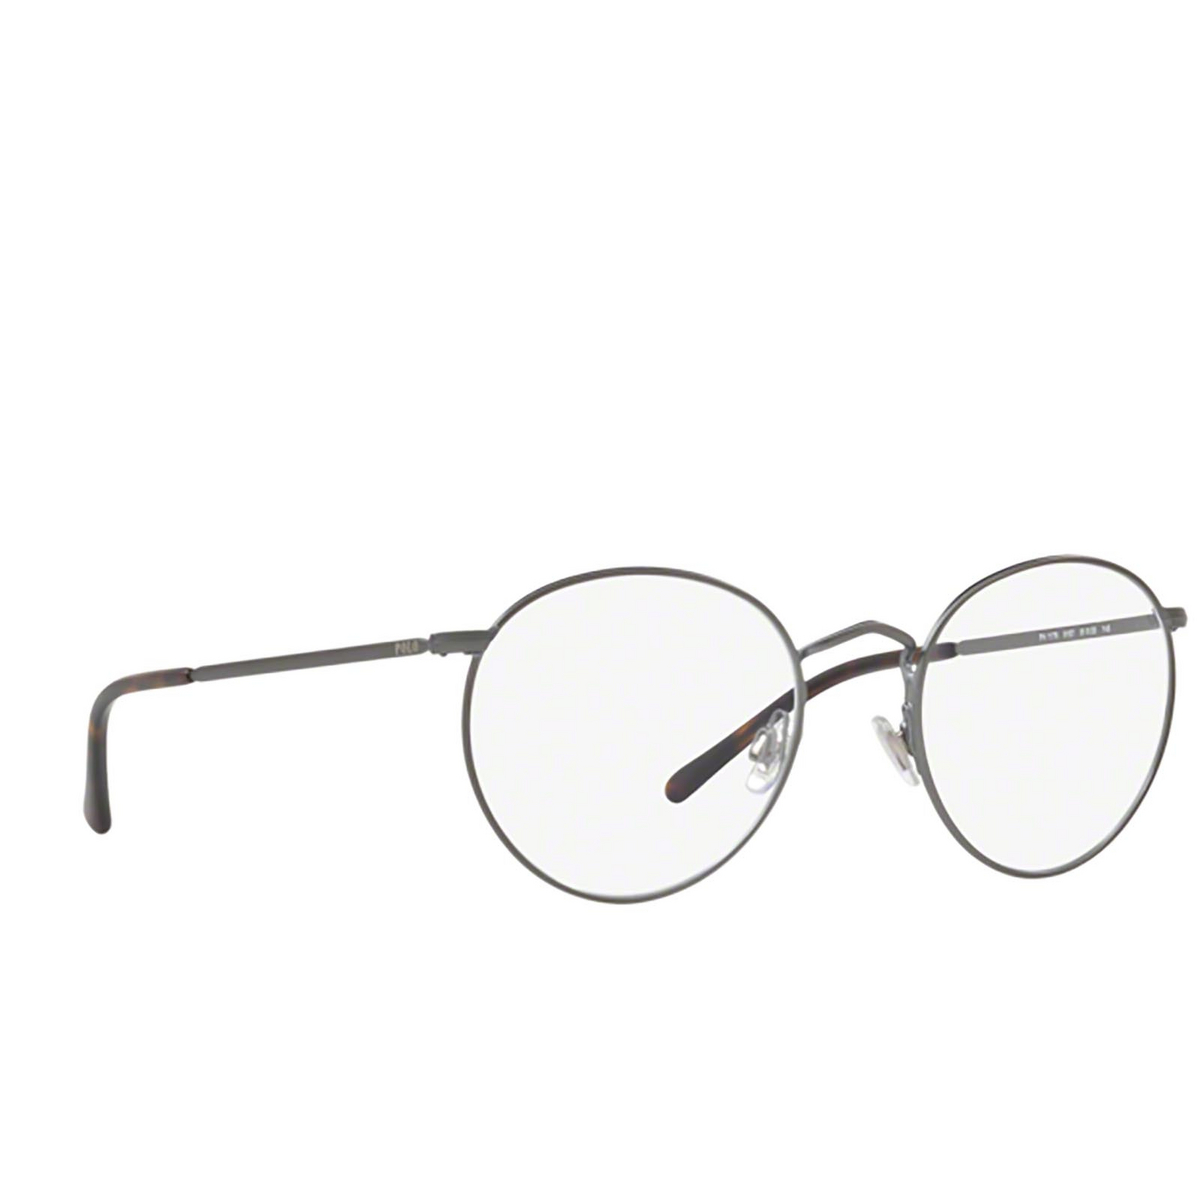 Polo Ralph Lauren® Round Eyeglasses: PH1179 color Semi-shiny Dark Gunmetal 9157.